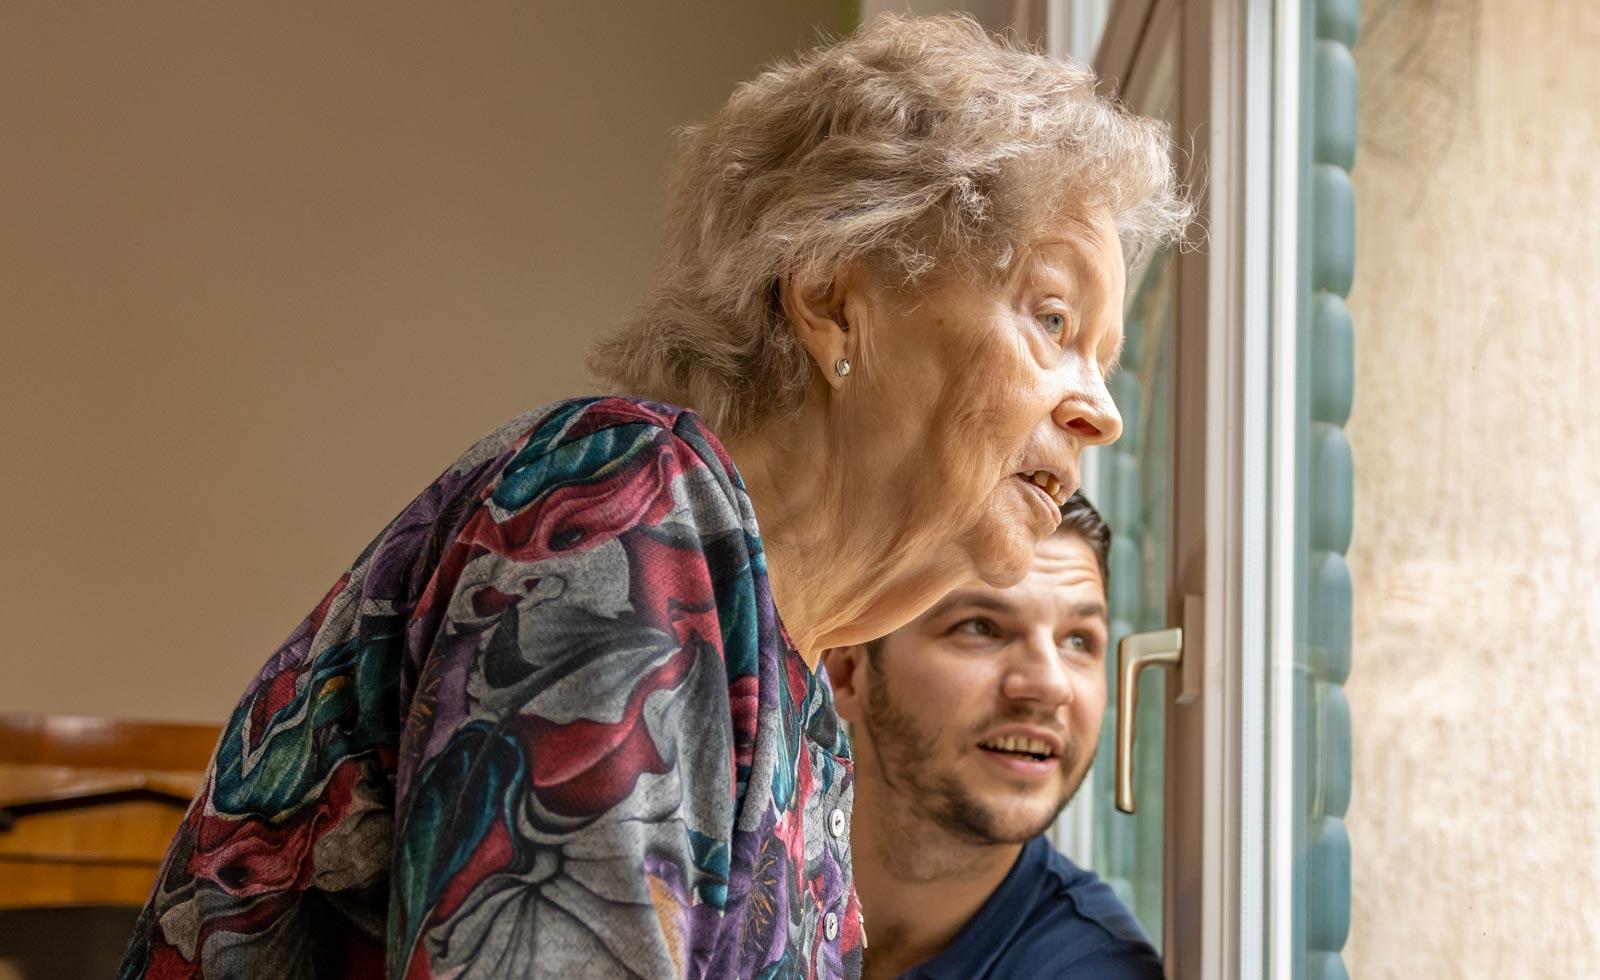 Stiftung Hospital St. Cyriaci et Antonii – Seniorin und Pfleger am Fenster